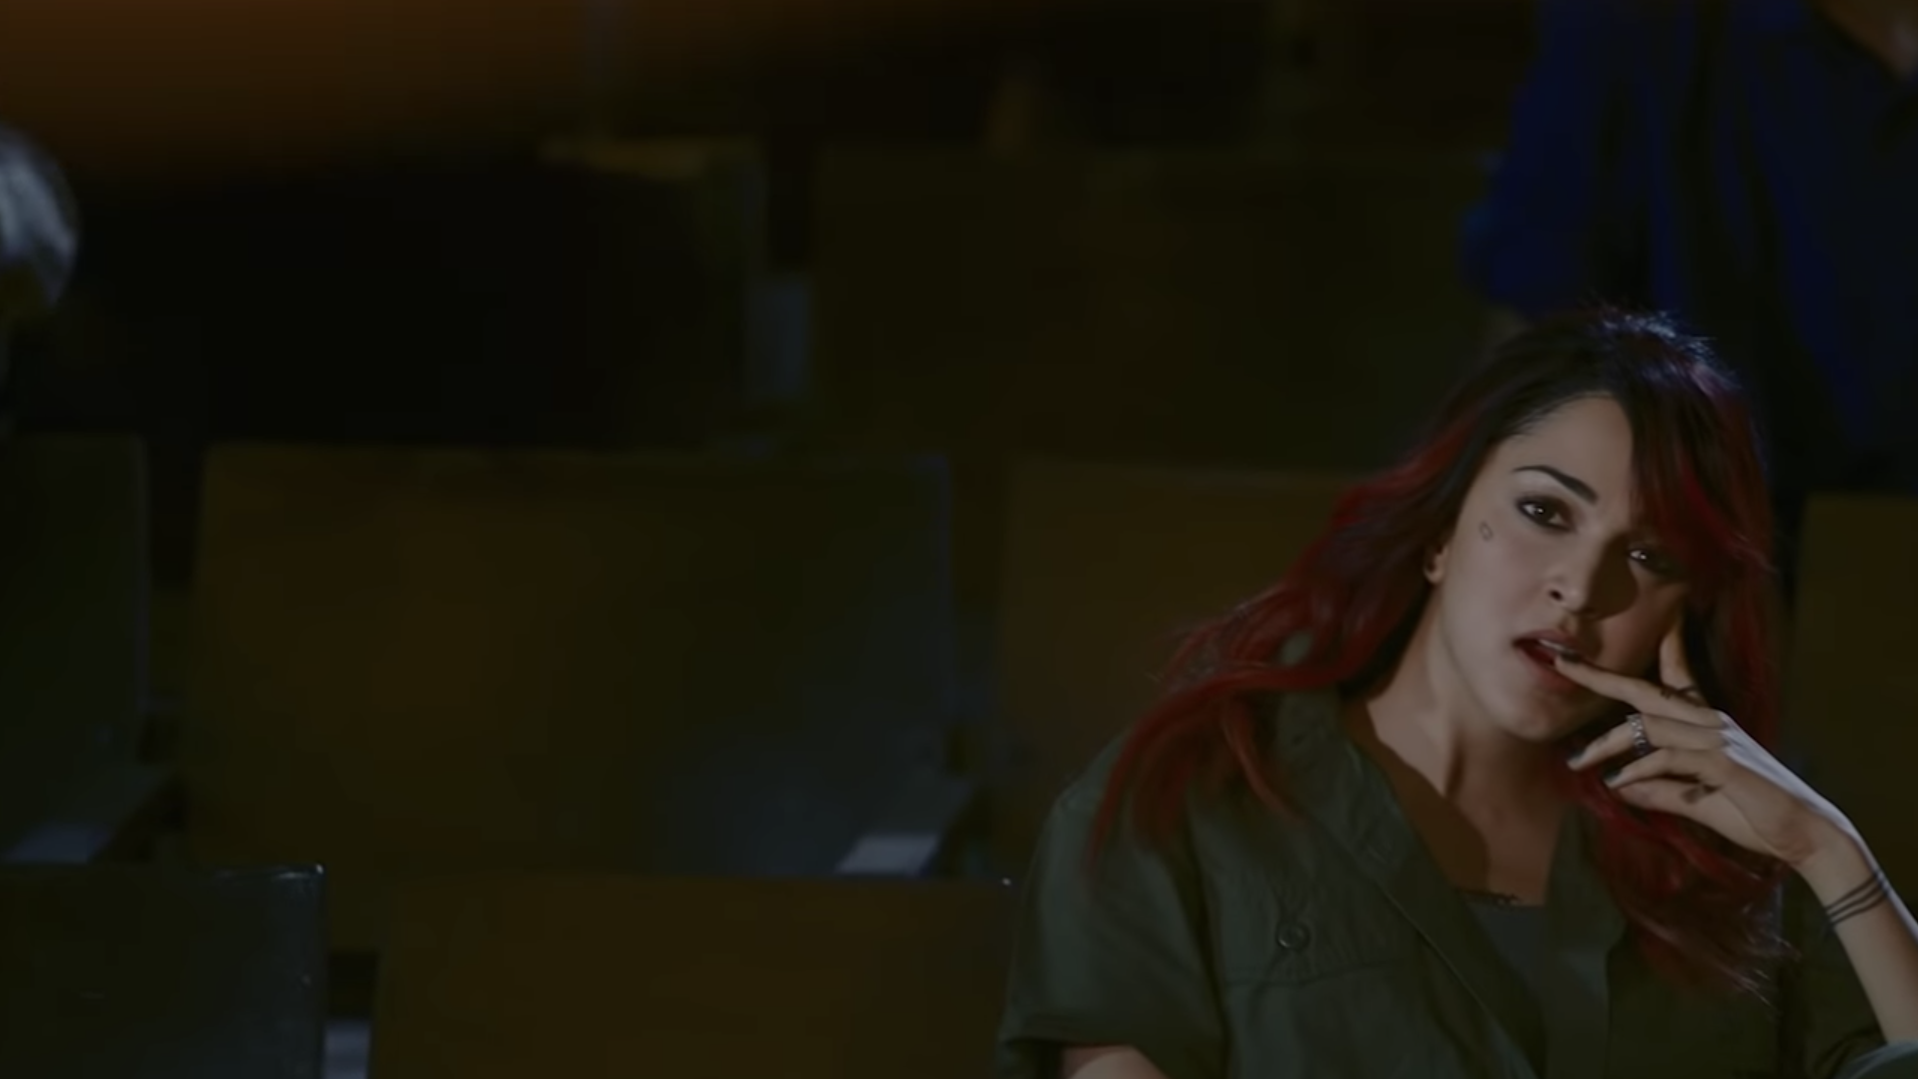 Kiara Advani in Netflix's Guilty